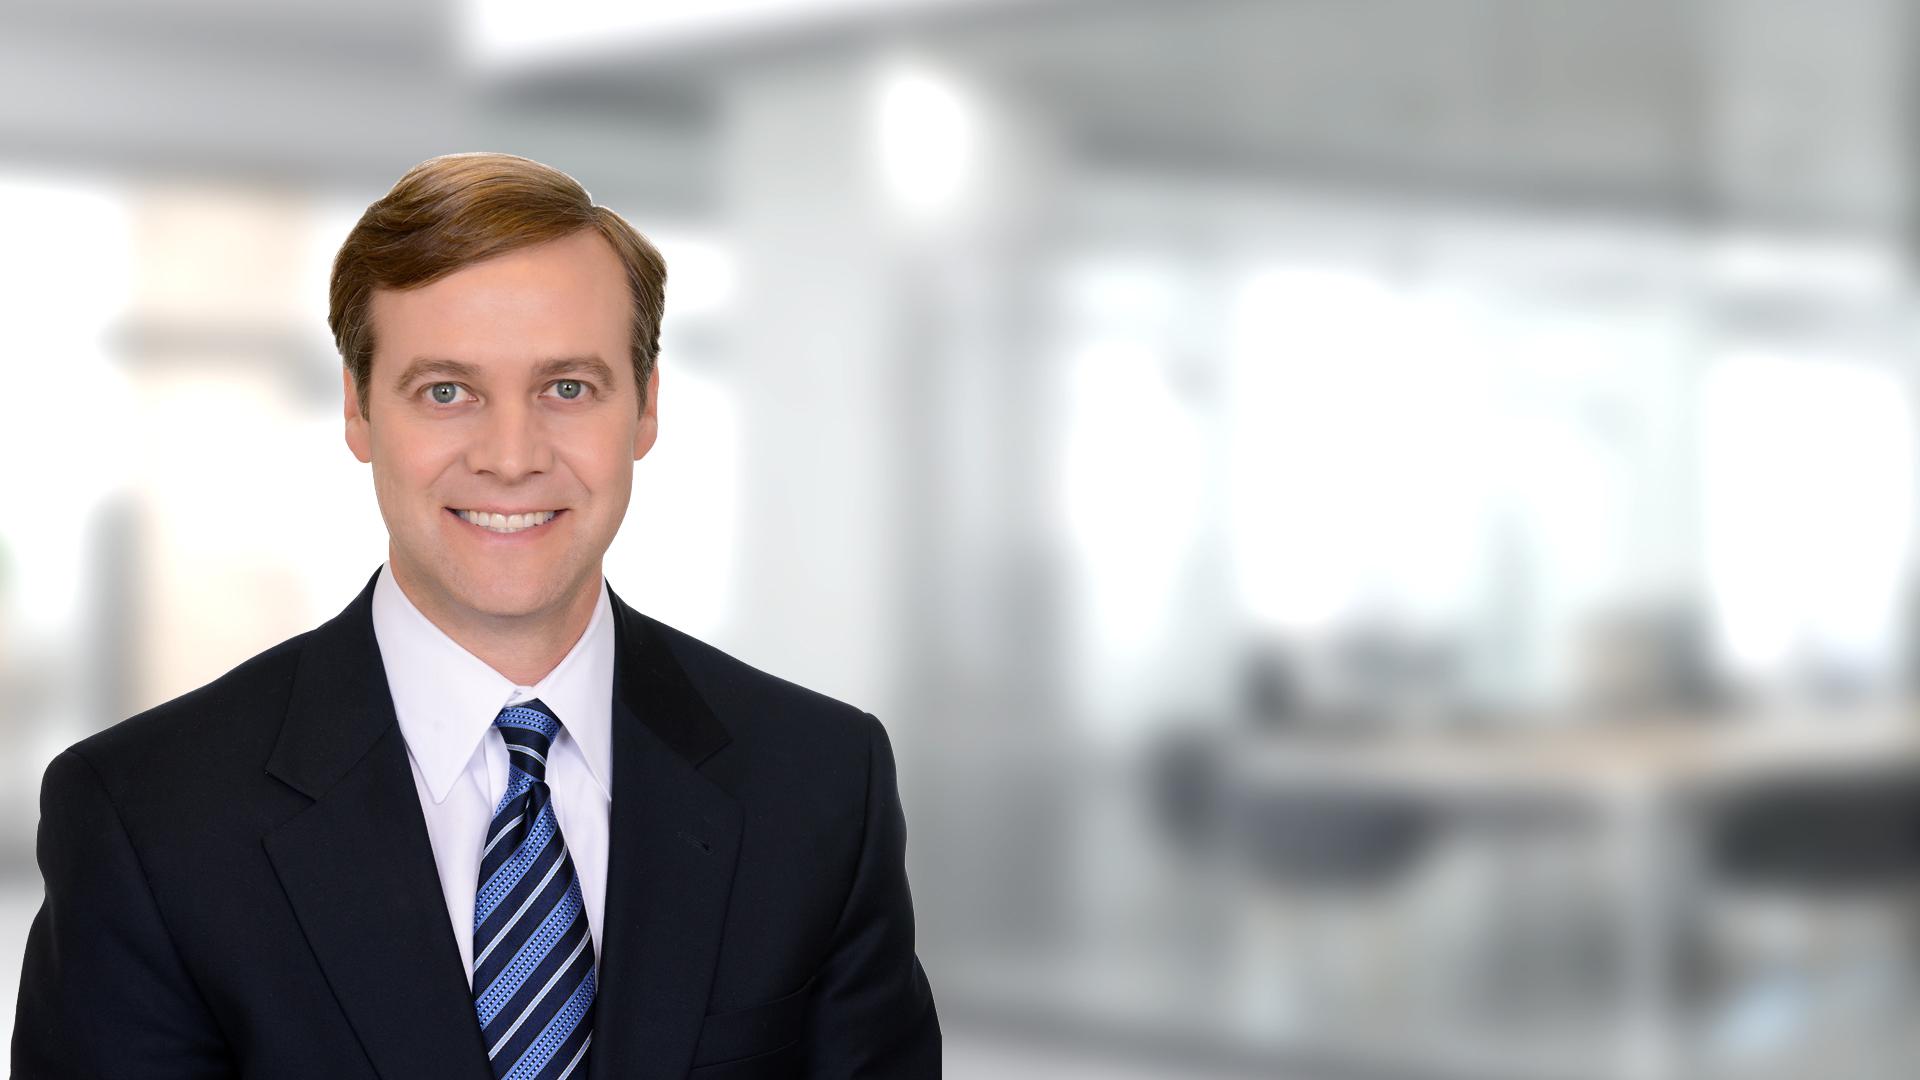 Richard Krumholz - Global Head of Litigation and Disputes